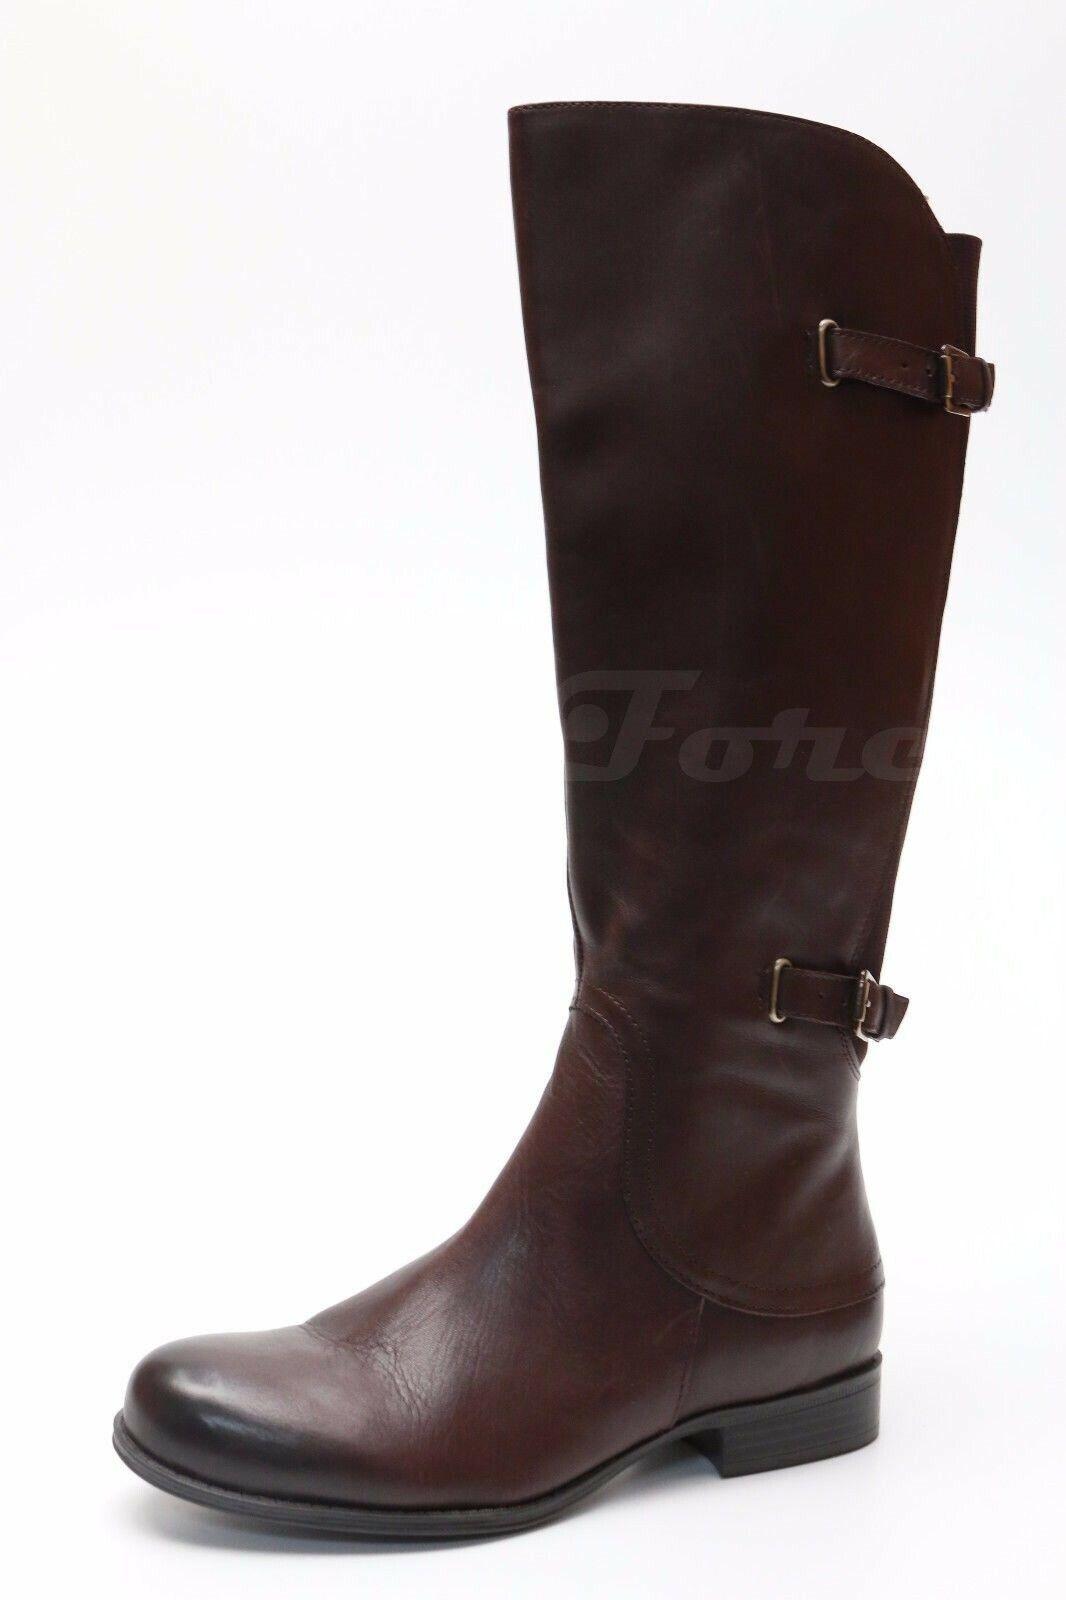 NATURALIZER JAMISON Brown Leather Knee High Boots Sz. 8 US 6 UK 39 EU